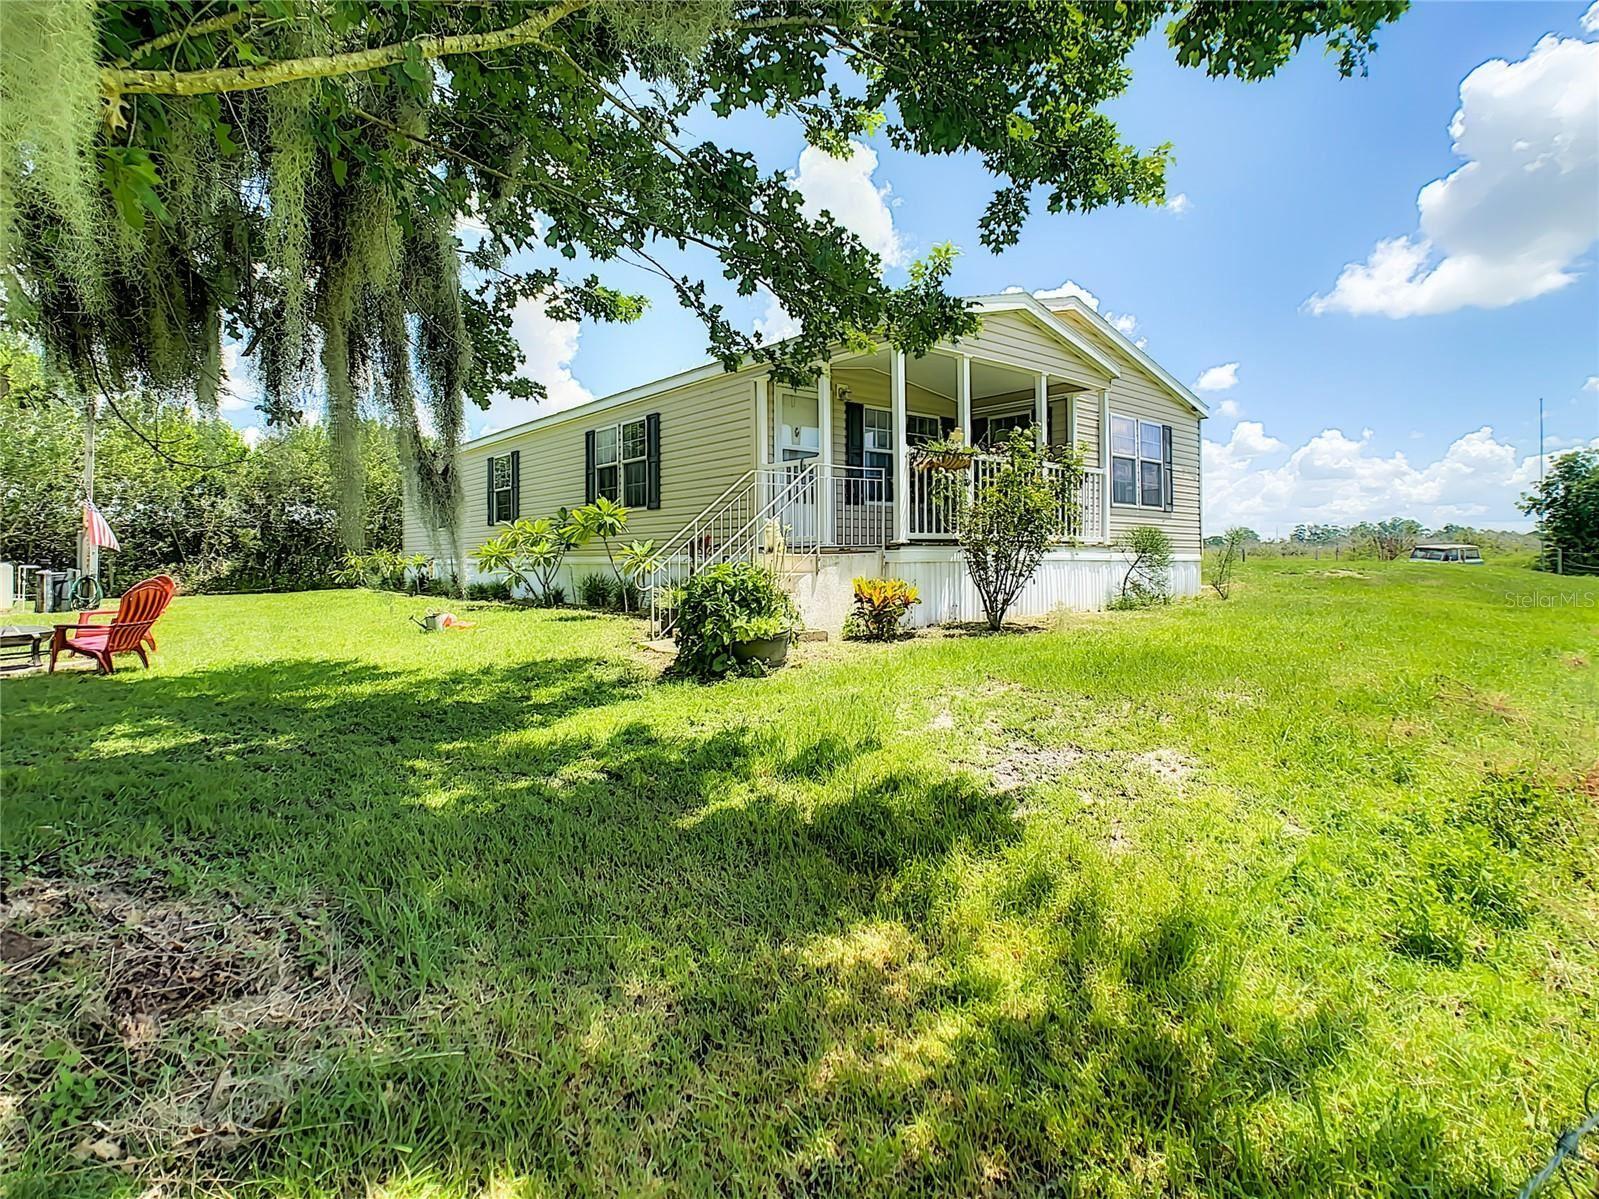 6460 HICKORY TREE ROAD, Saint Cloud, FL 34772 - #: S5053896